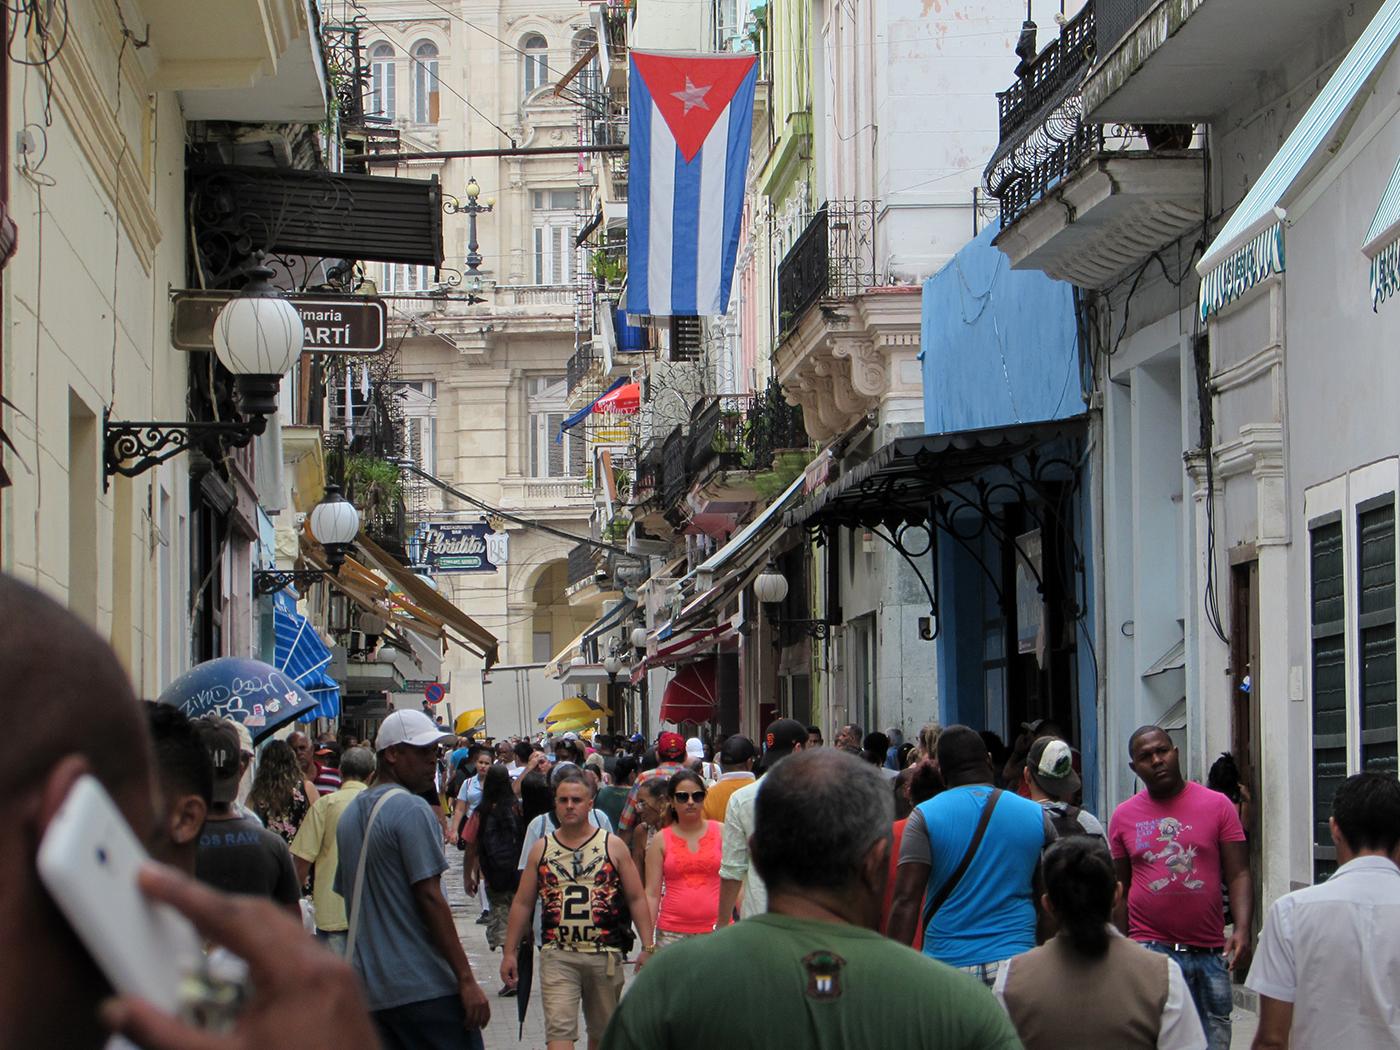 Cuba. Calle Obispo.